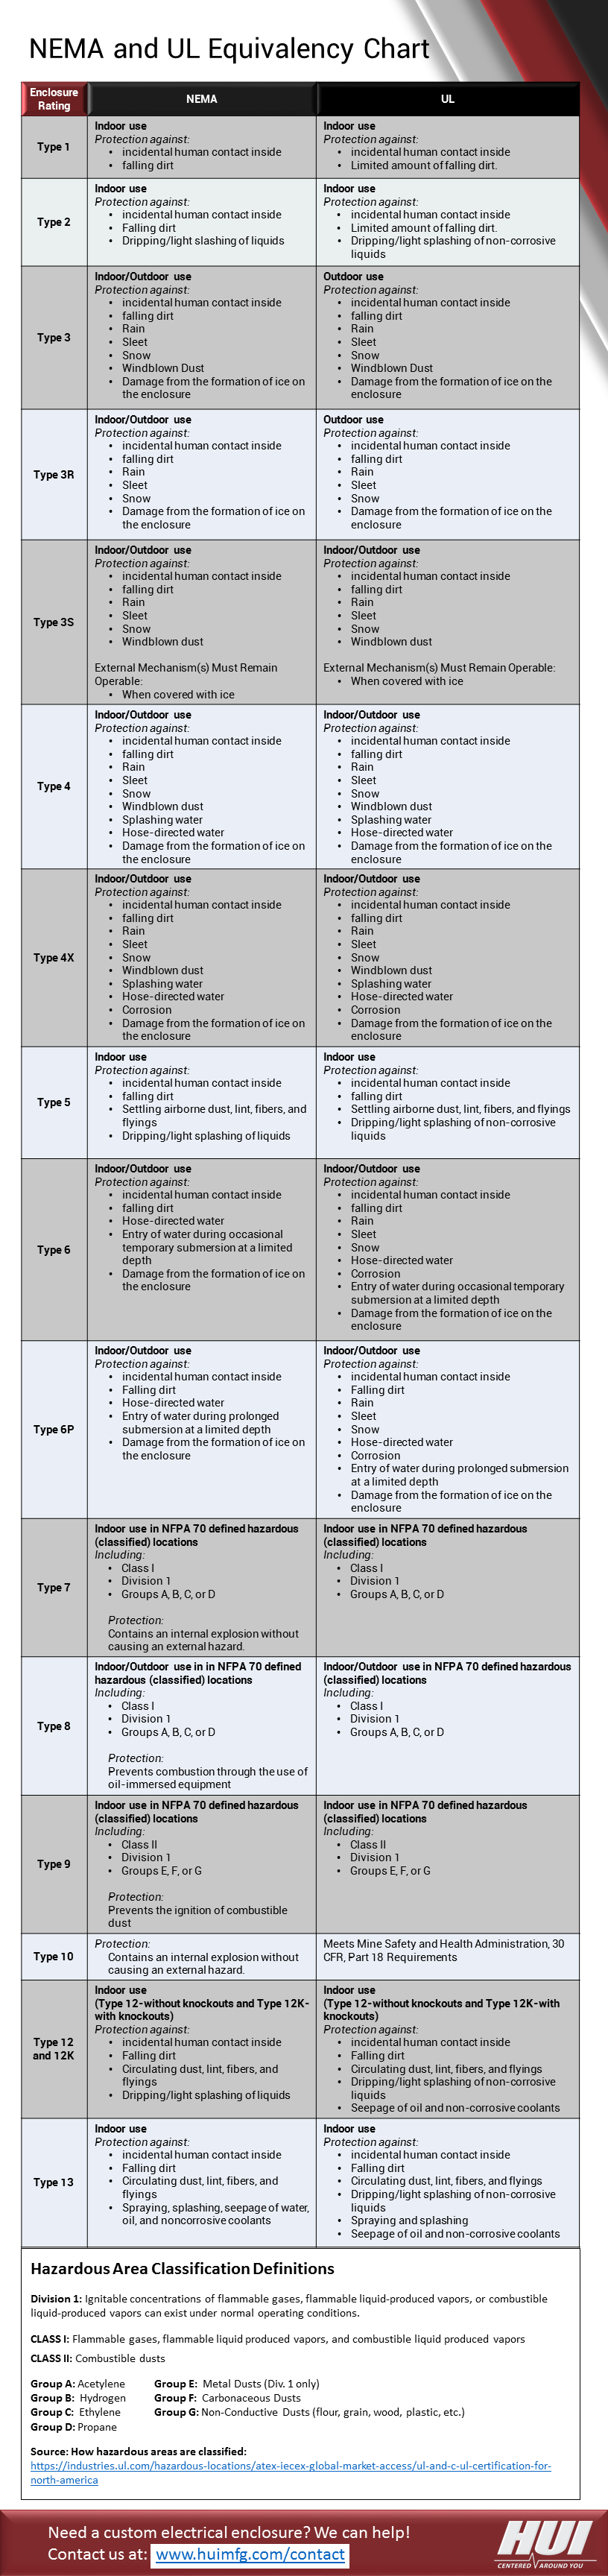 NEMA and UL Equivalency Chart